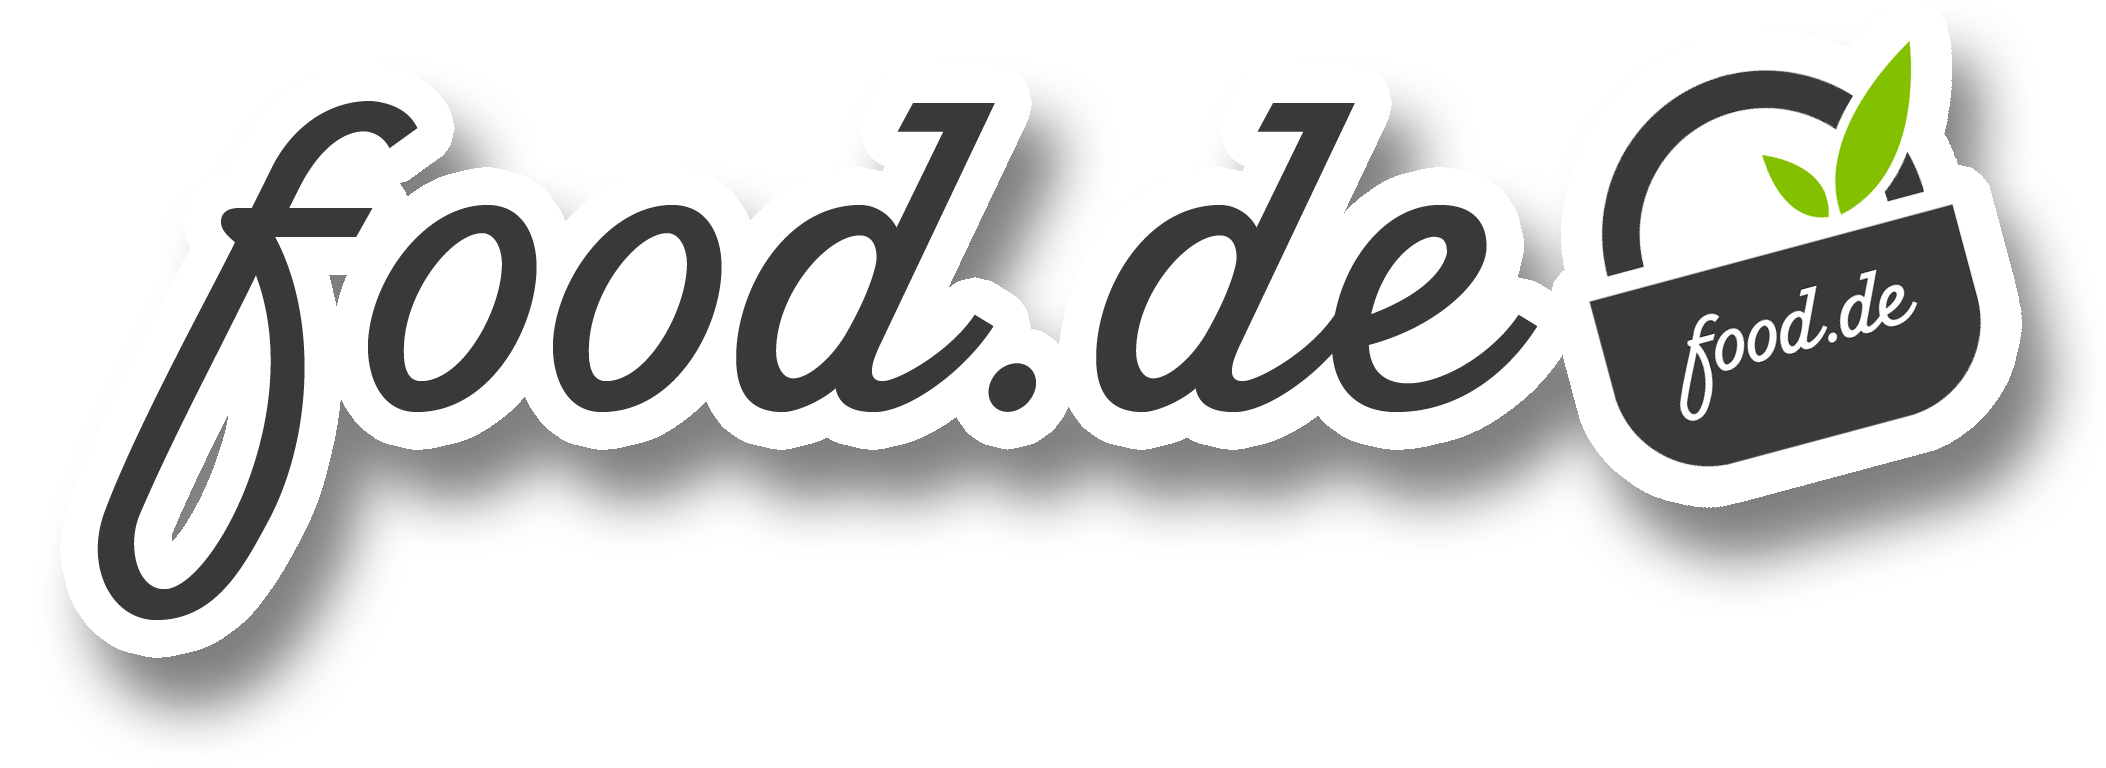 food direkt company logo